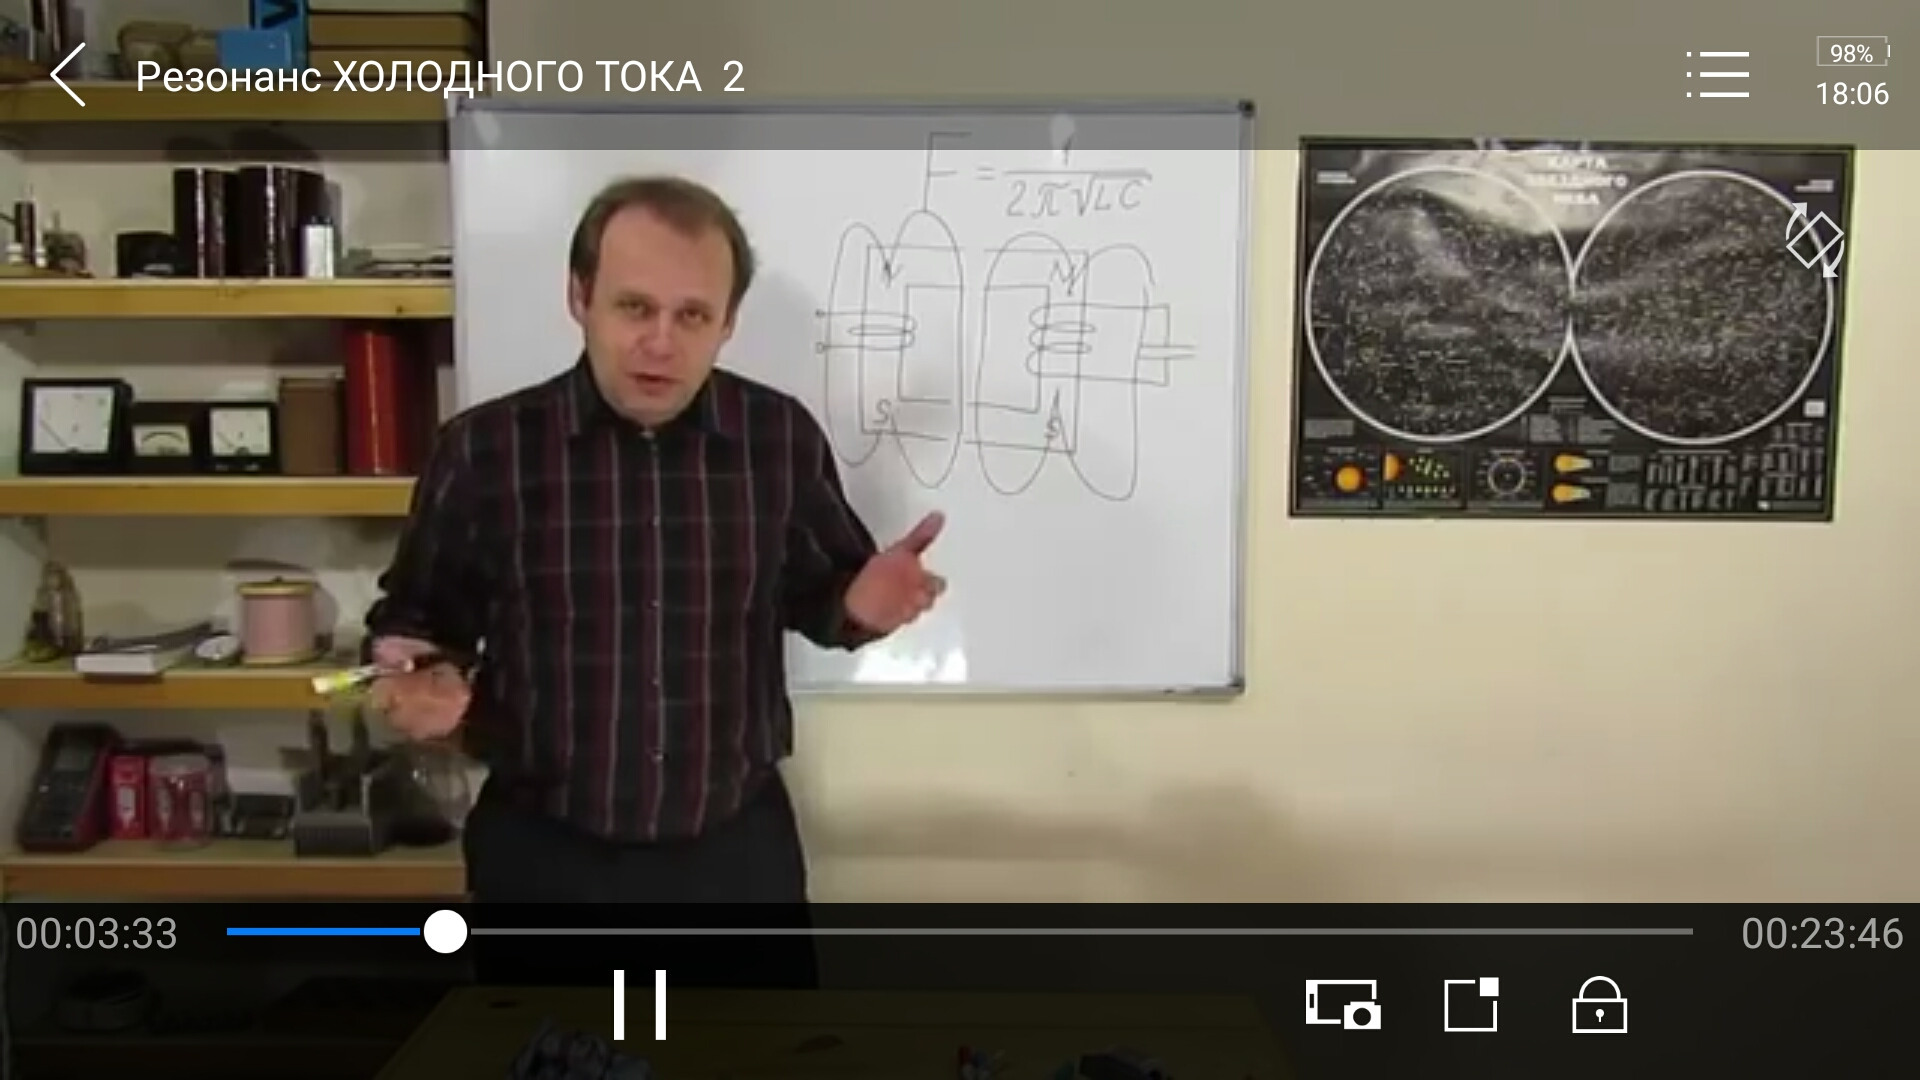 Snimka_obrazovky_2017-08-21-18-06-27-315.jpeg